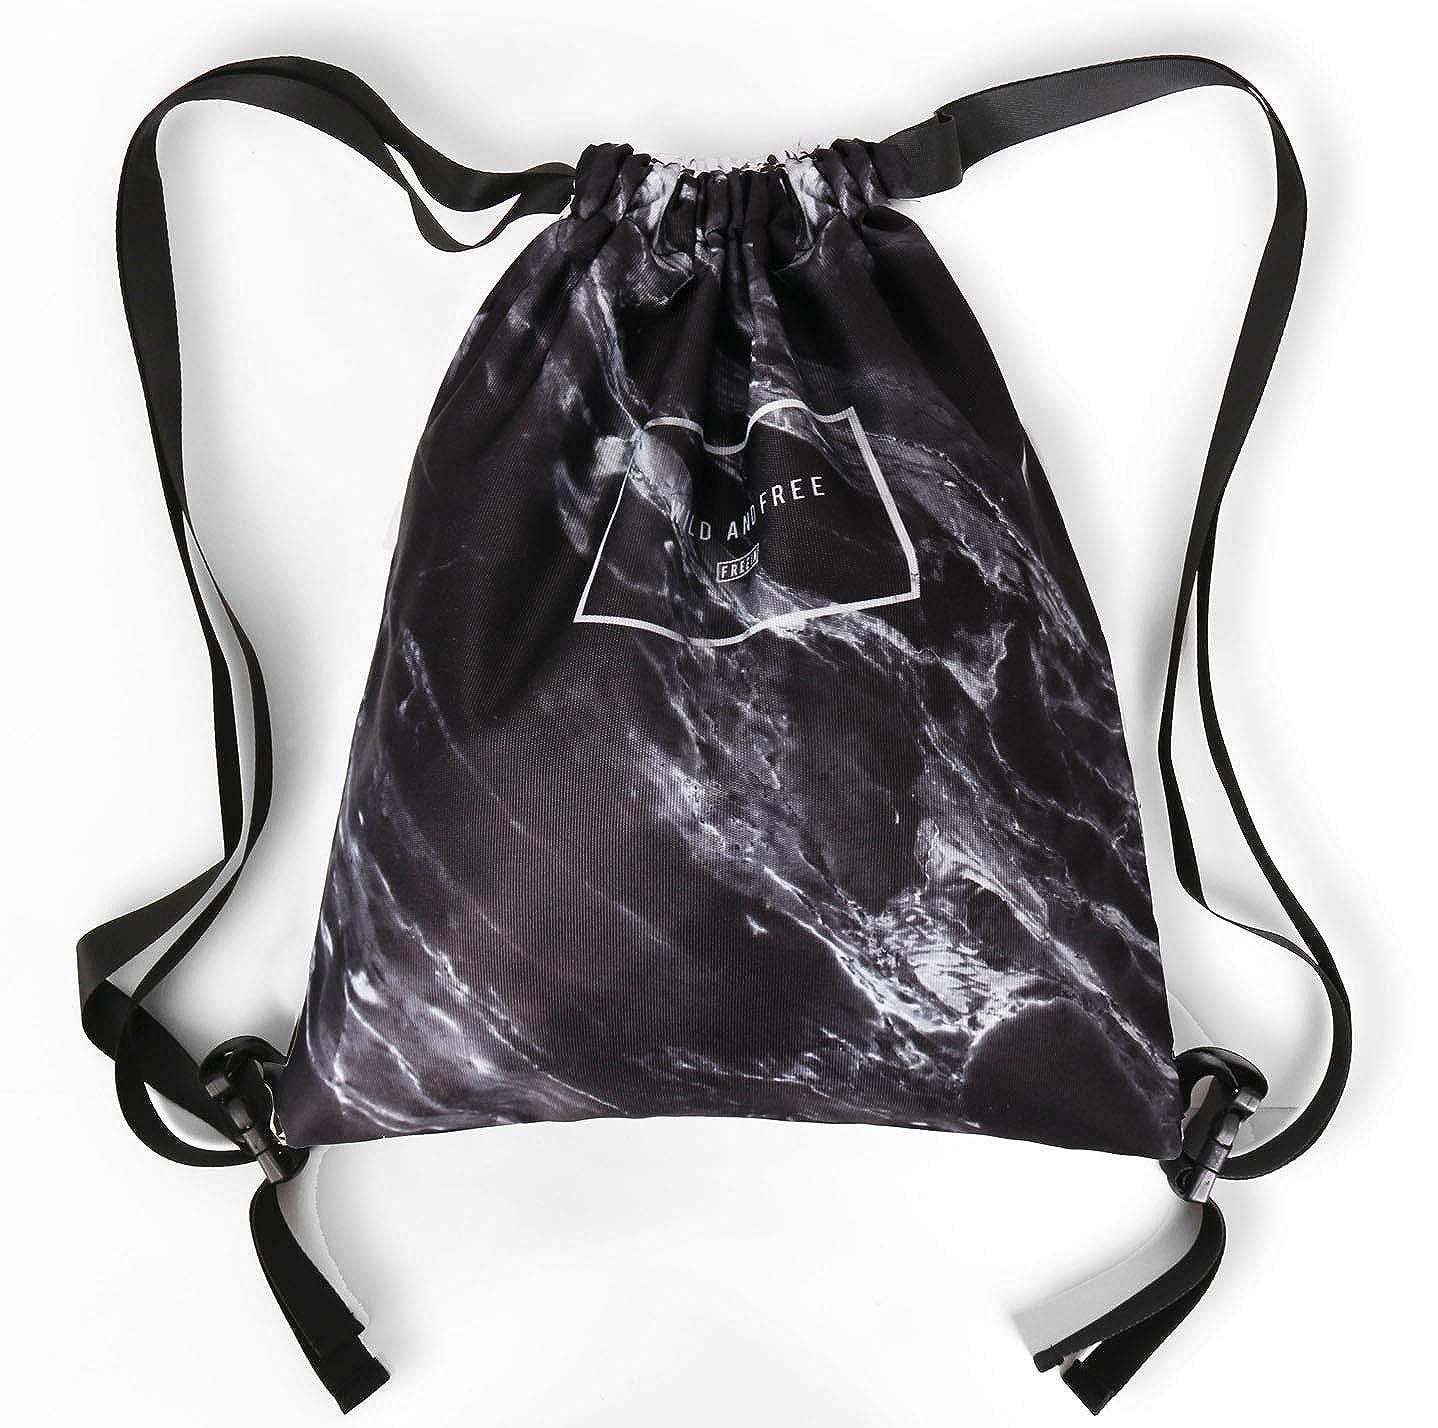 amazhu DrawstringバックパックFoldable Cinch Sack基本Sackpackジムトートバッグダンスバッグfor Swimmingショッピングスポーツレディースメンズボーイズガールズ B07HB44ST4 Marbleblack